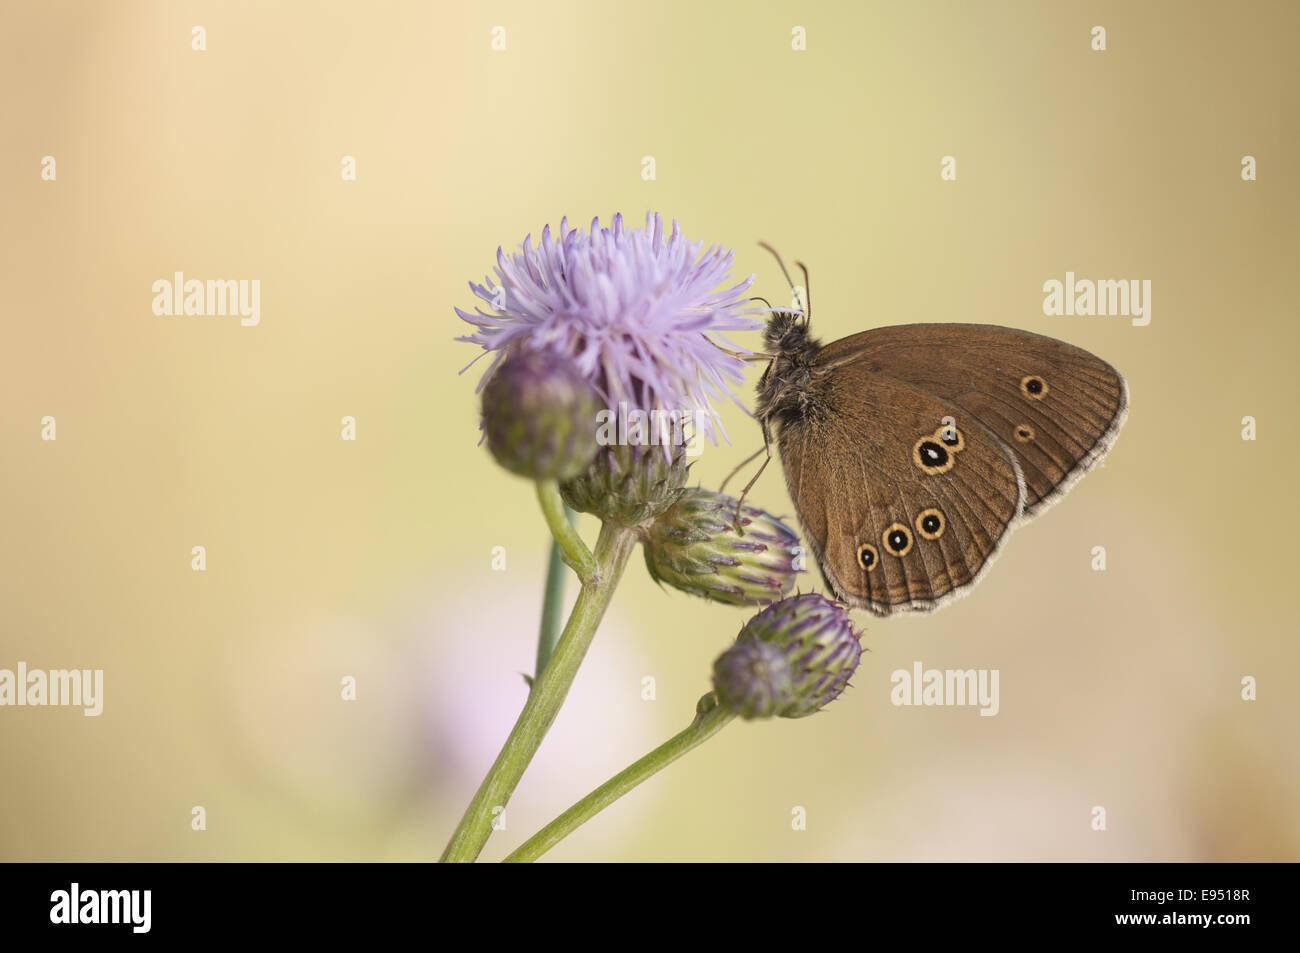 Ringel (Aphantopus Hyperantus), Deutschland Stockbild